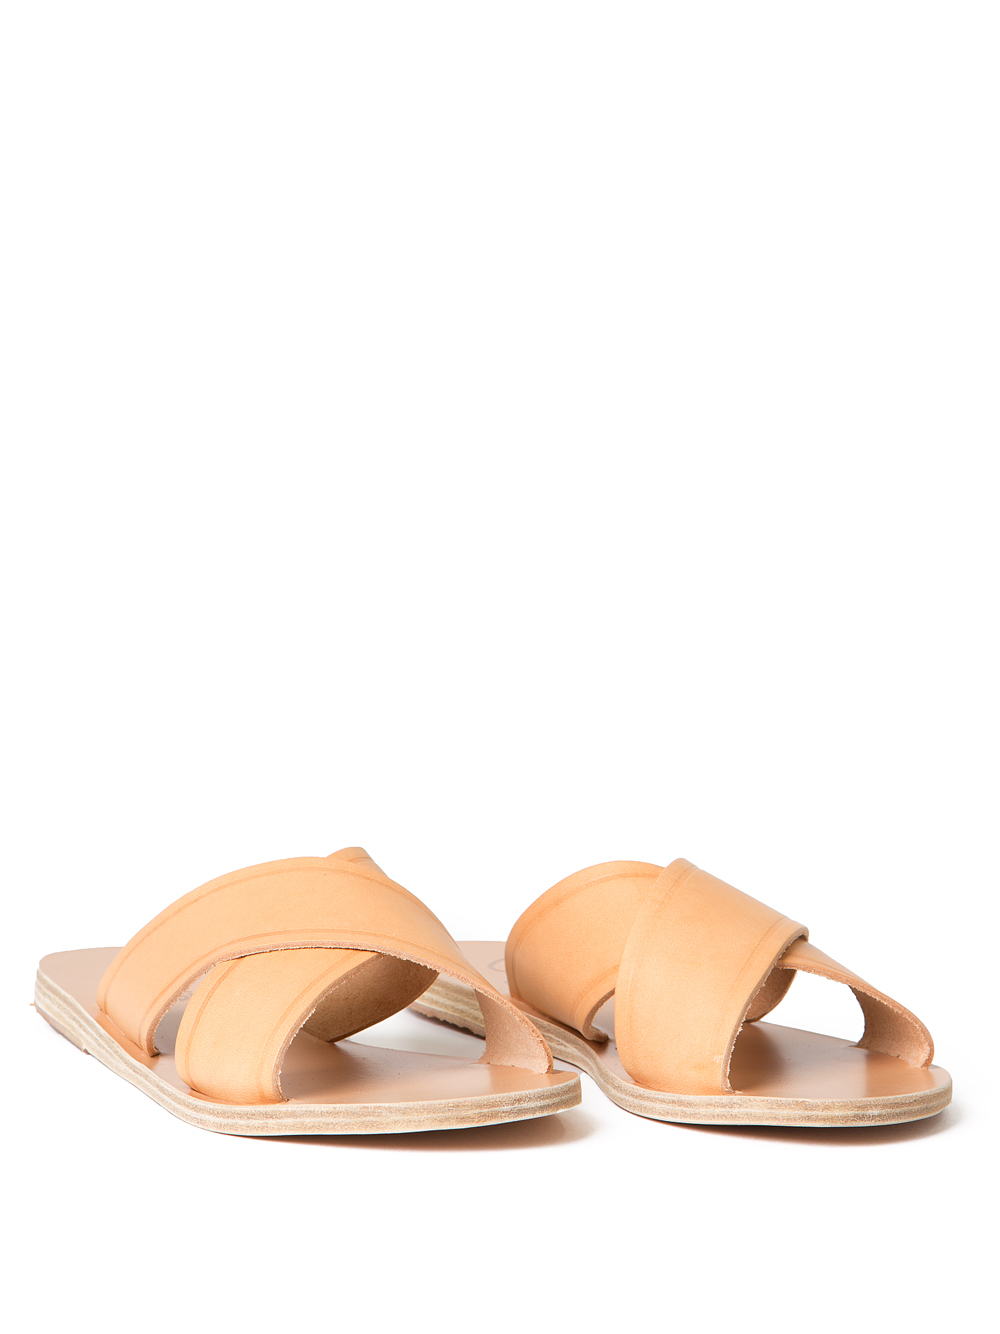 Ancient greek sandals Thais Slide in Natural